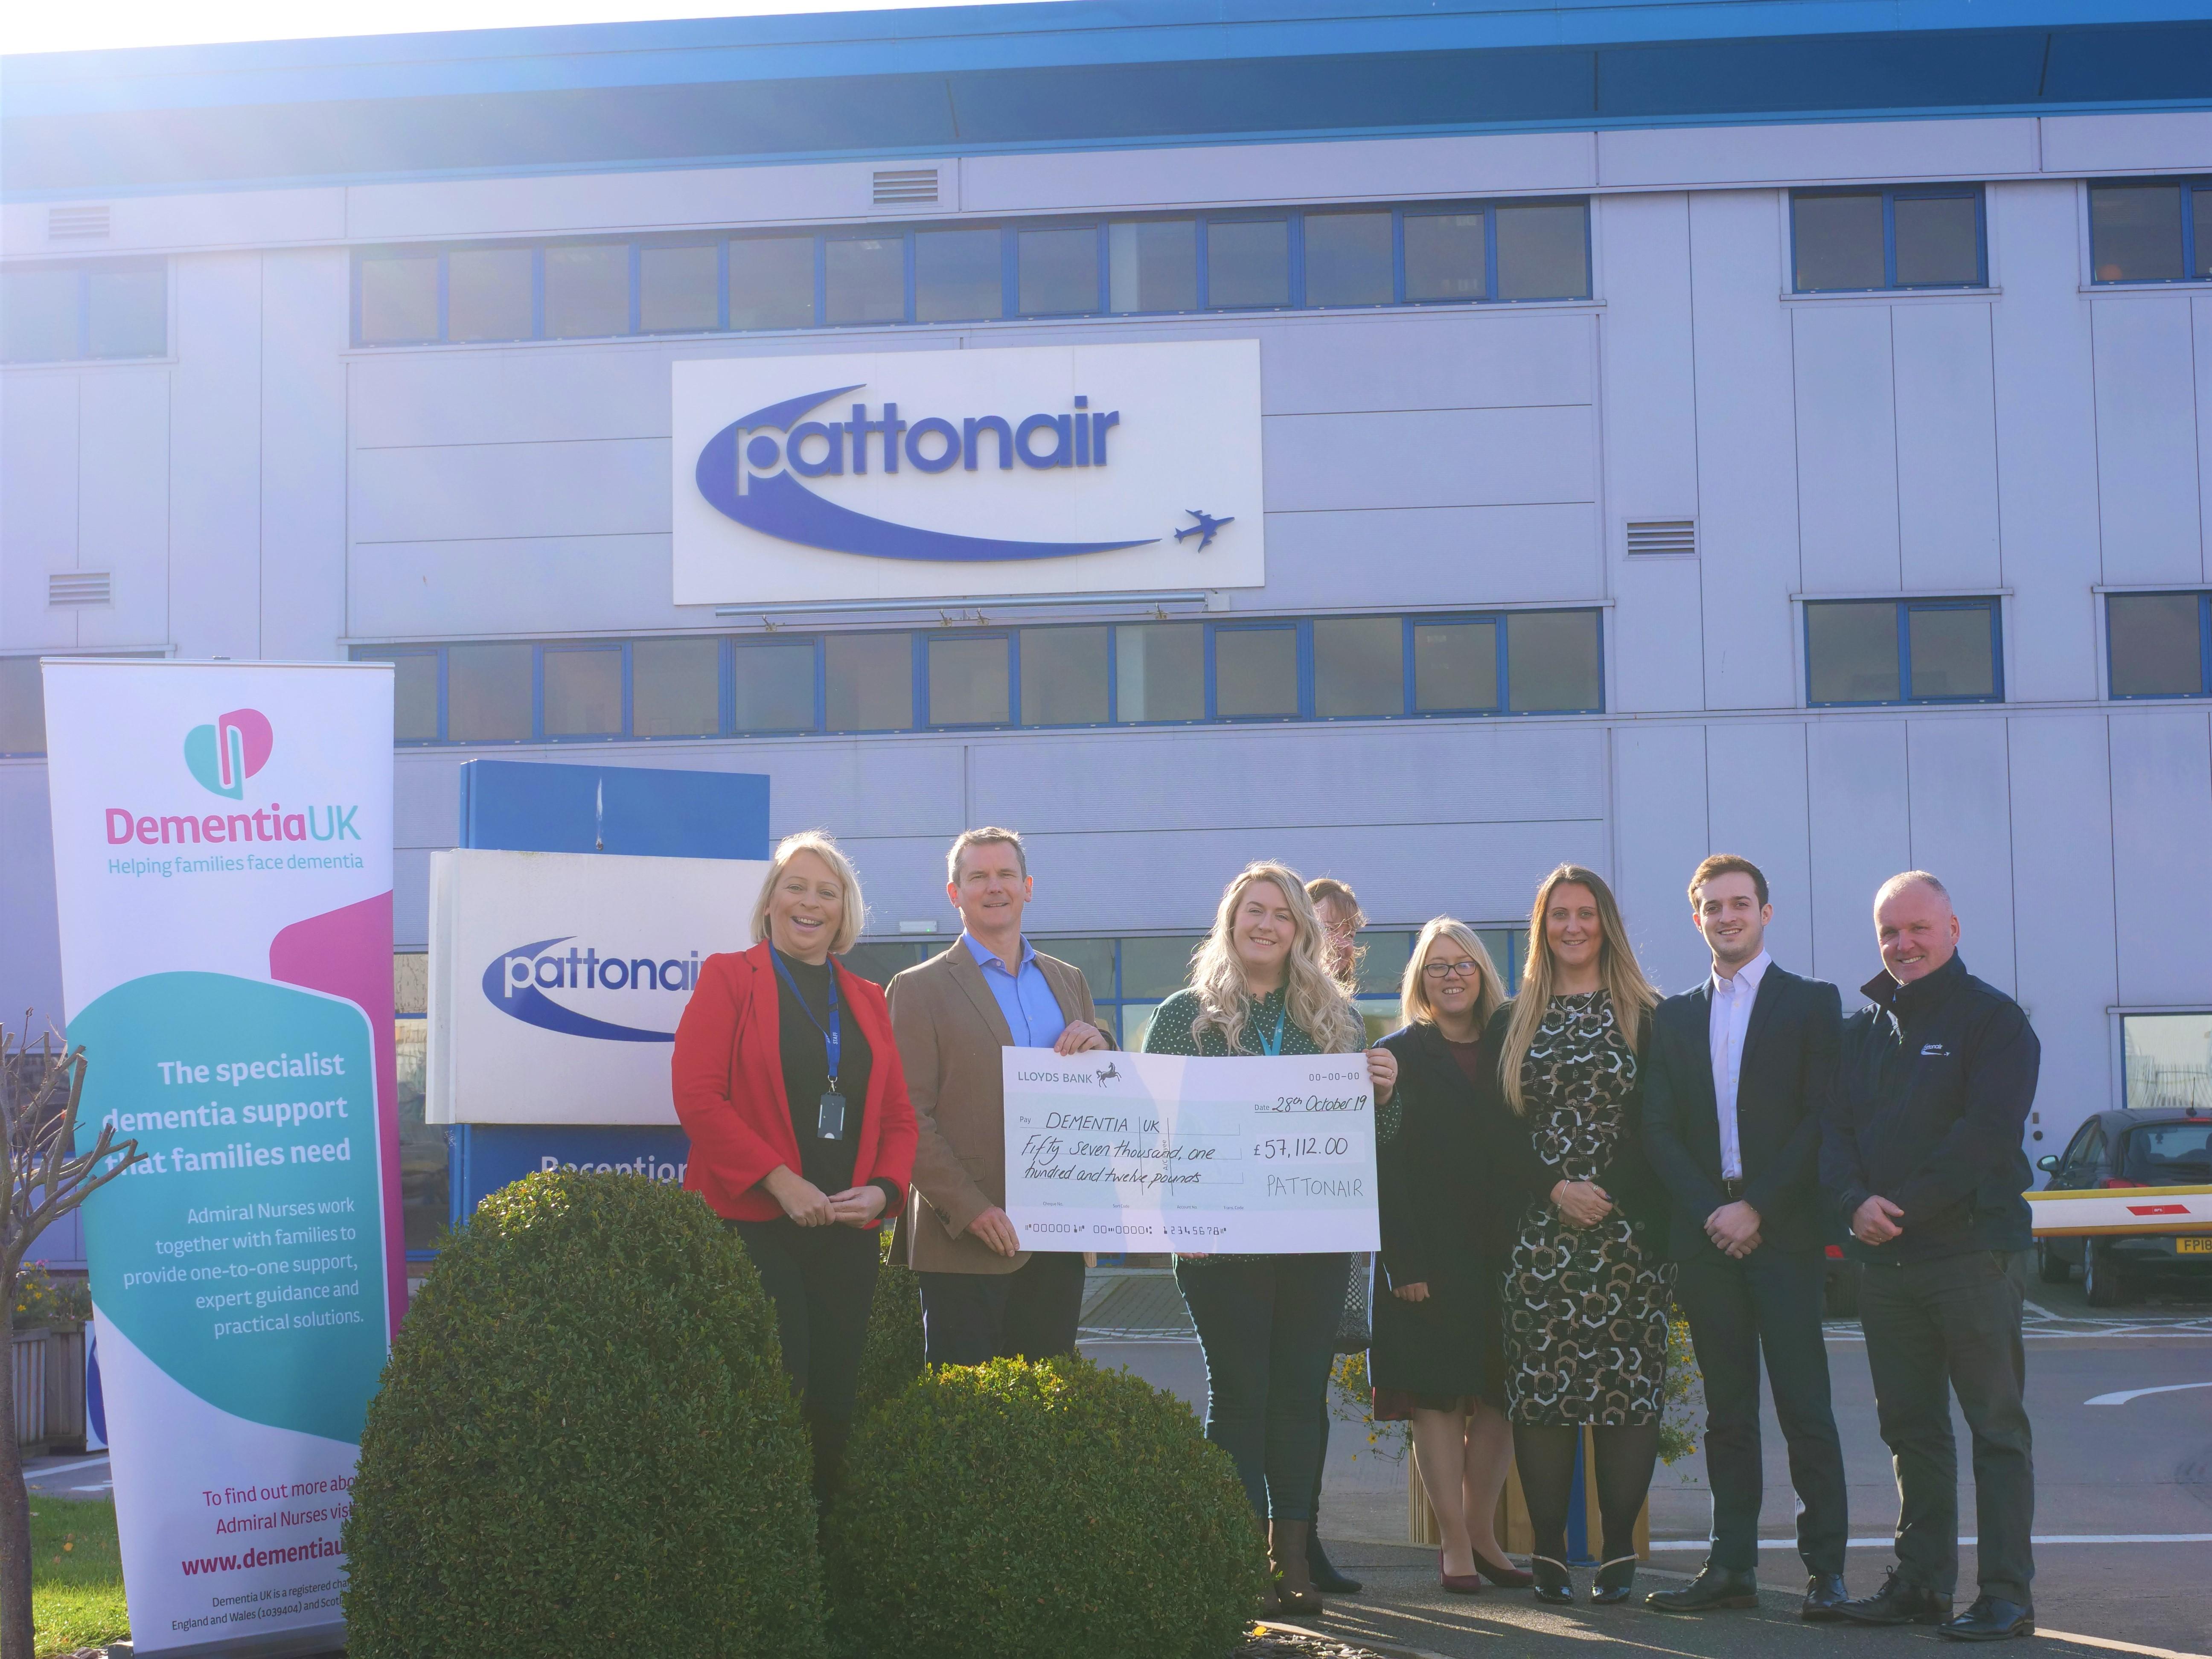 Pattonair Autumn ball raises thousands for Dementia UK